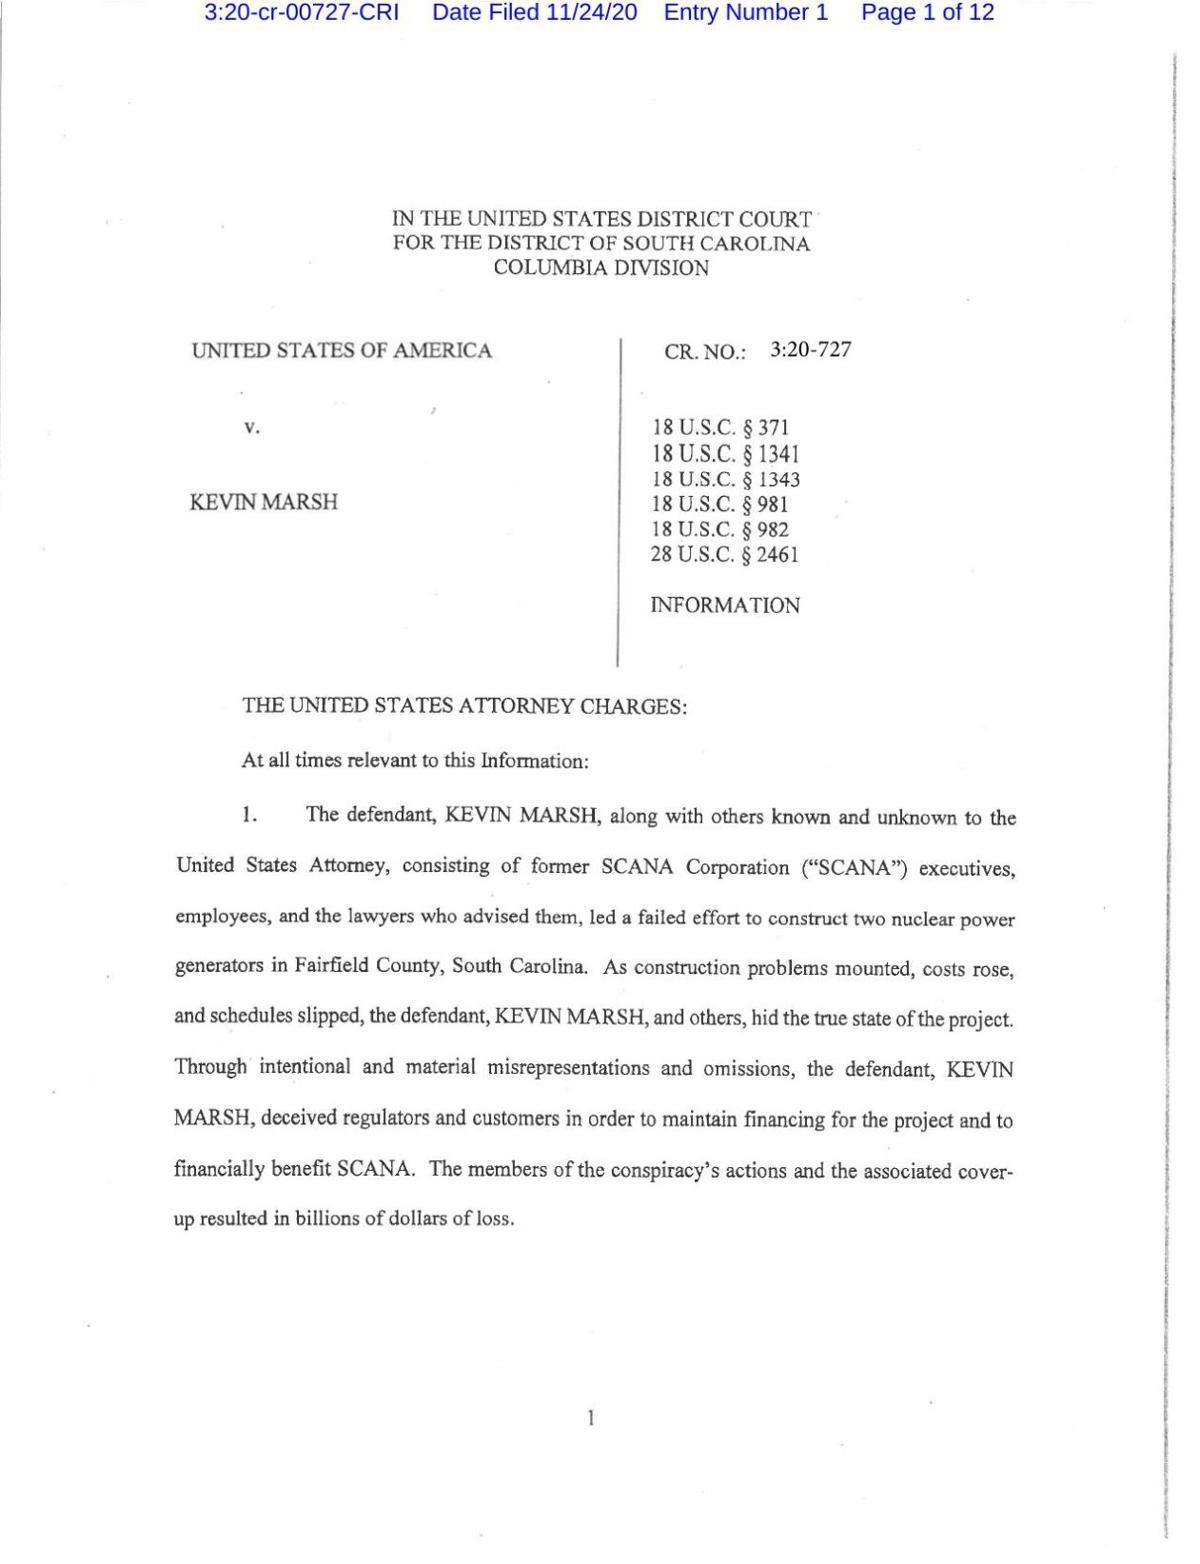 Kevin Marsh plea filing